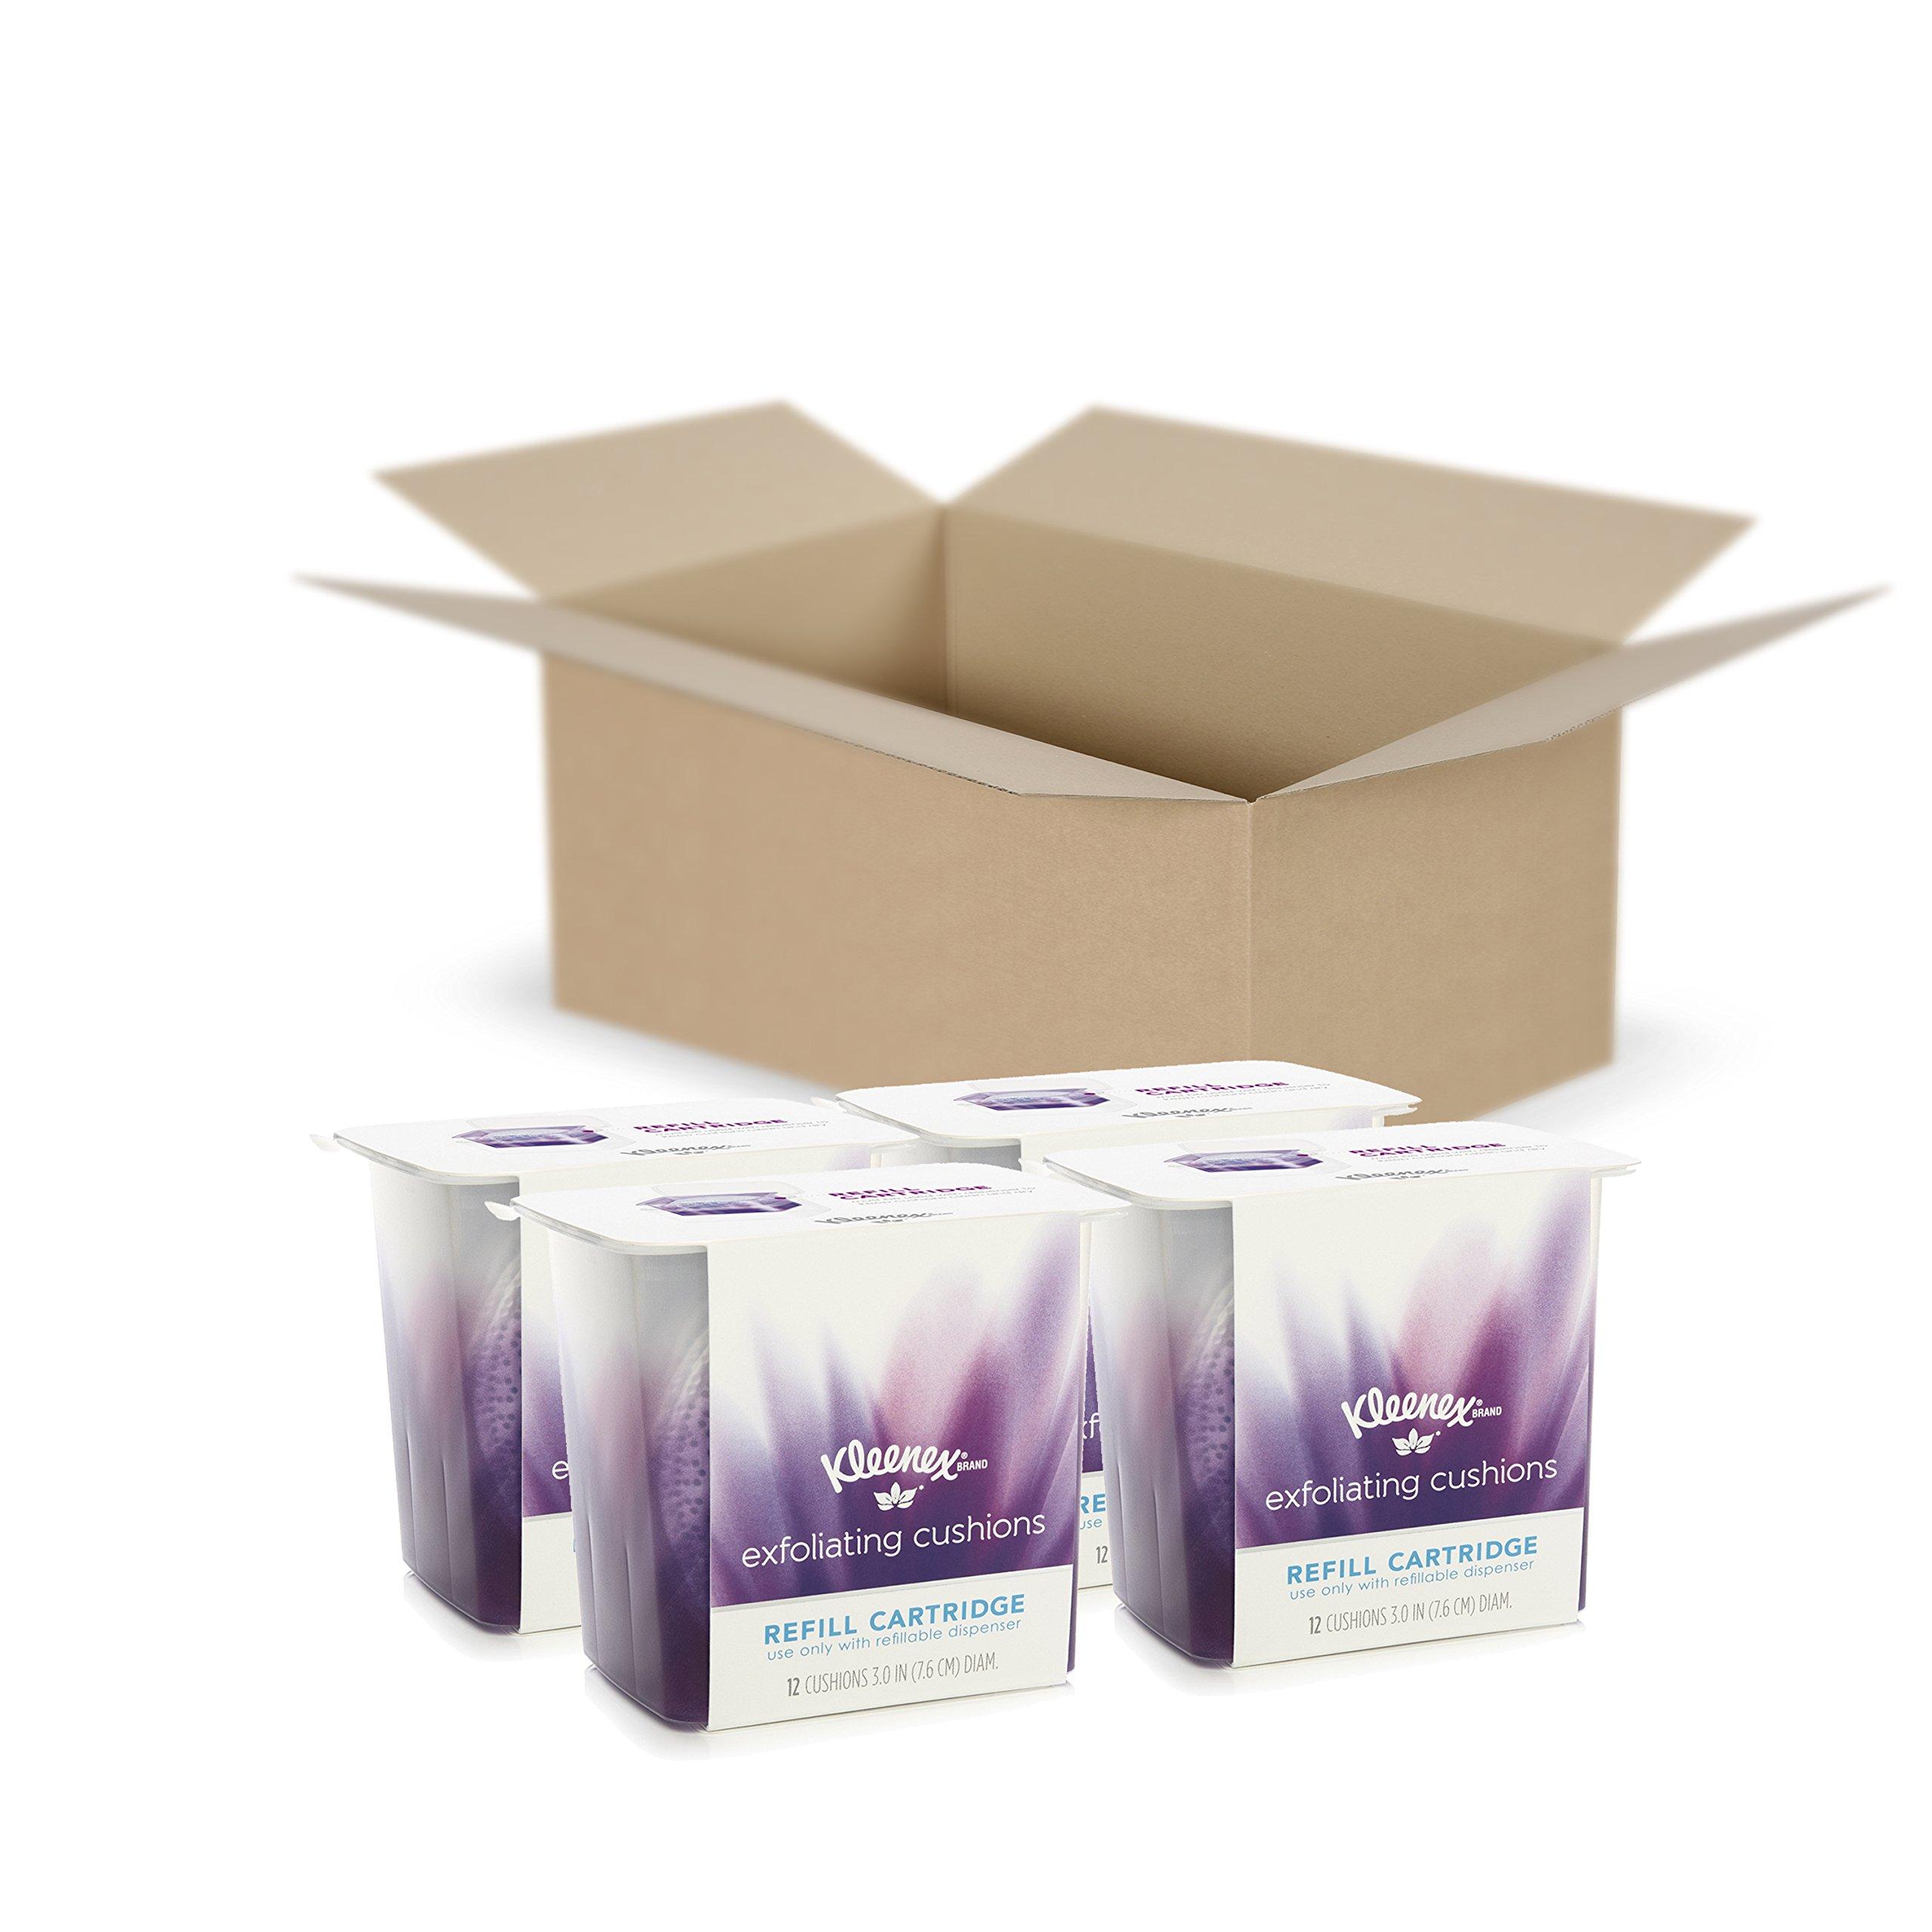 Kleenex Exfoliating Cushions, Refill Cartridge, 12 Count, Pack of 4